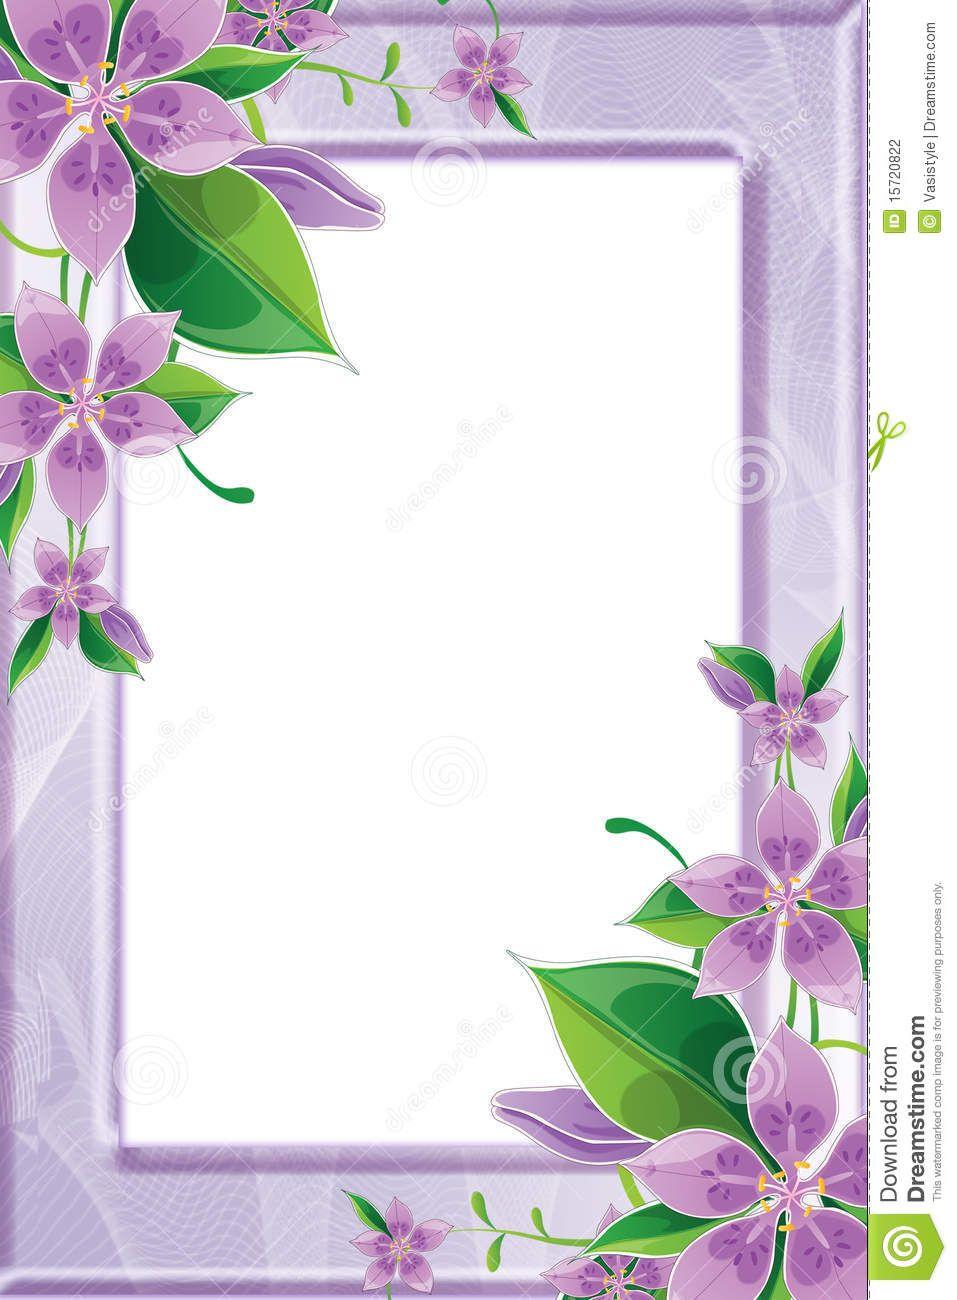 Purple flower borders and frames stock photography photo frame purple flower borders and frames stock photography photo frame with purple flowers jeuxipadfo Gallery